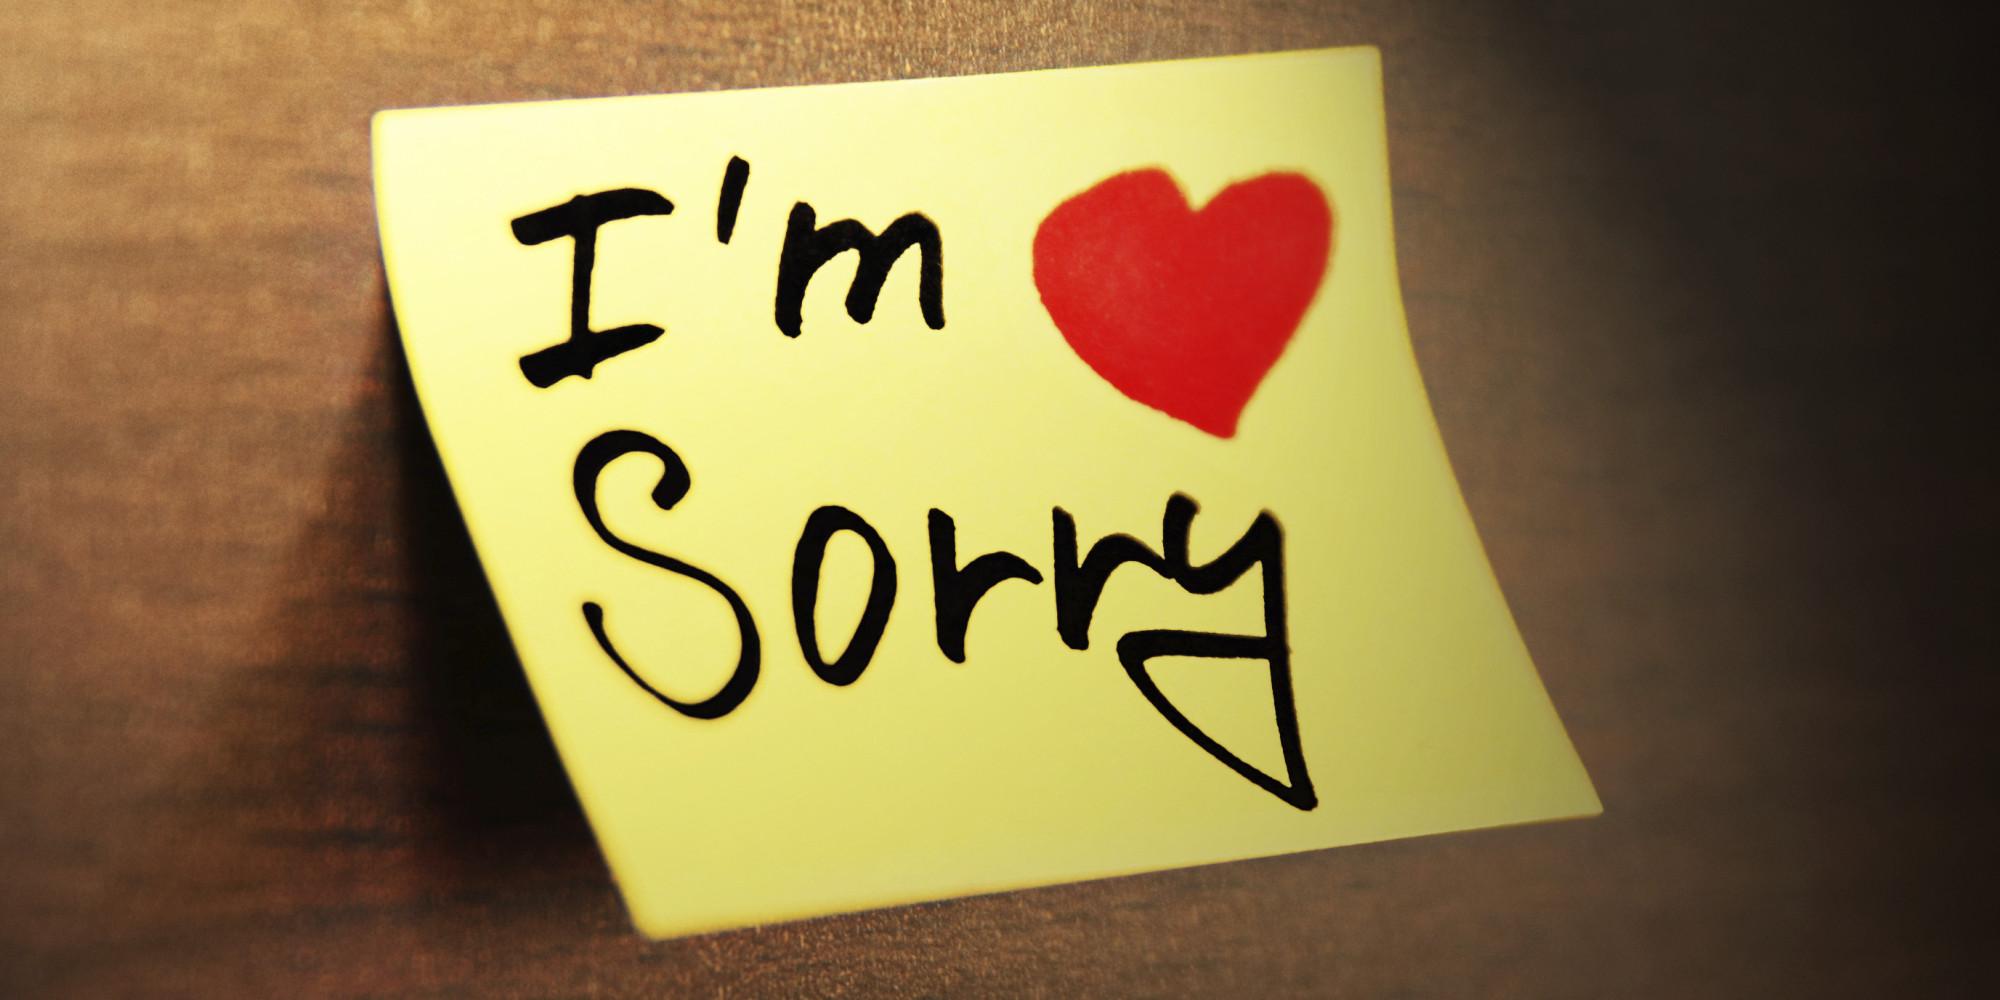 صورة رسائل اعتذار للحبيب , بوستات بها اجمل عبارات الاعتذار